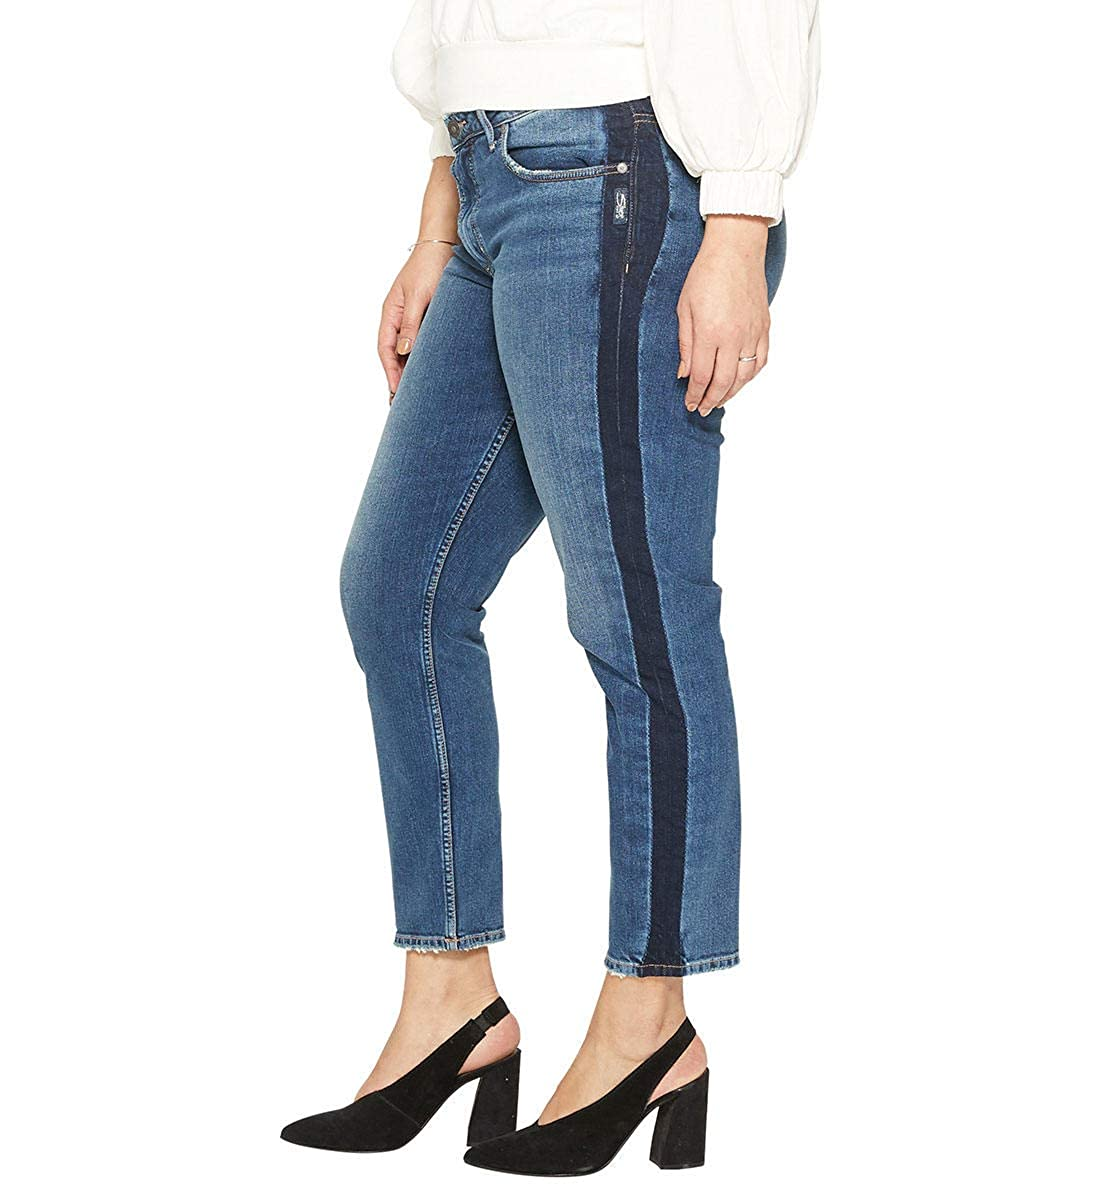 5796fe3d036 Silver Jeans Co. Women s Plus Size Vintage Slim Tuxedo Stripe Jeans at  Amazon Women s Clothing store